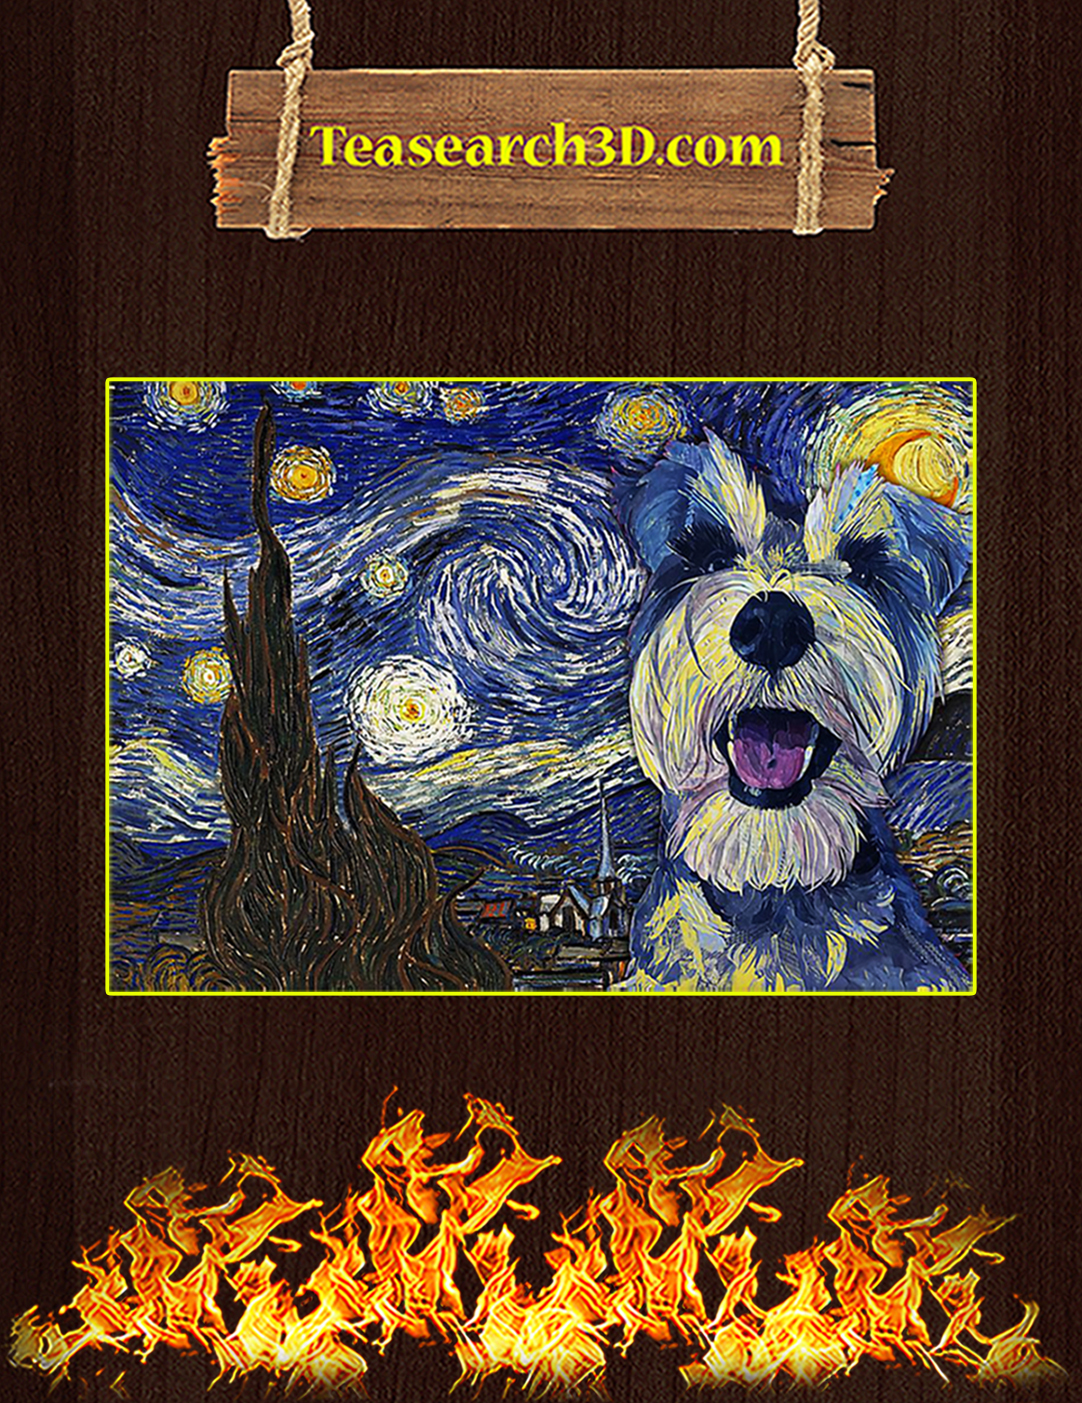 Schnauzer starry night van gogh poster A2